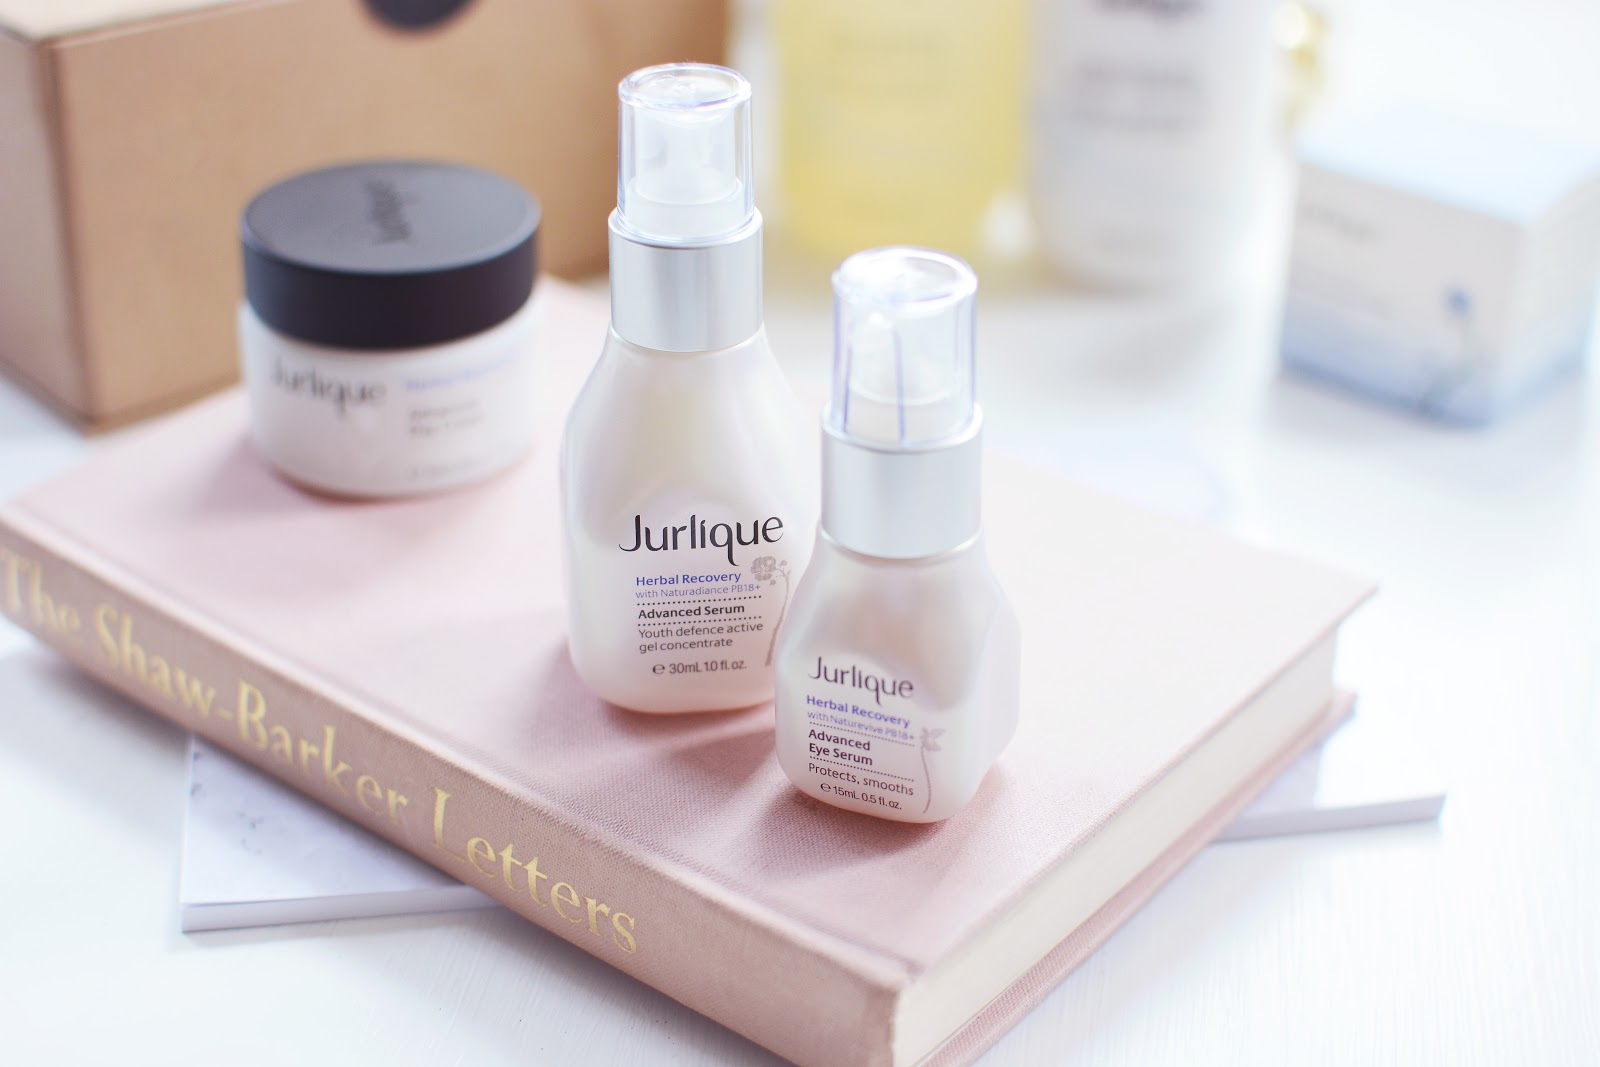 Jurlique Herbal Recovery Advanced Serum & Herbal Recovery Advanced Eye Serum